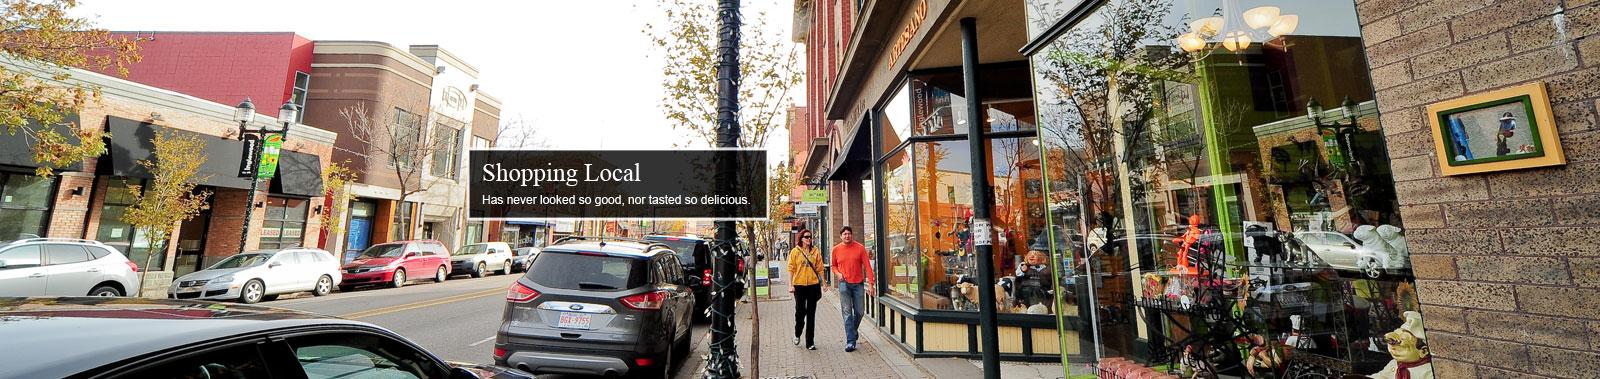 Atlantic Avenue, Main Street Inglewood was Calgary's original Main Street before the Canadian Pacific Railway arrived.